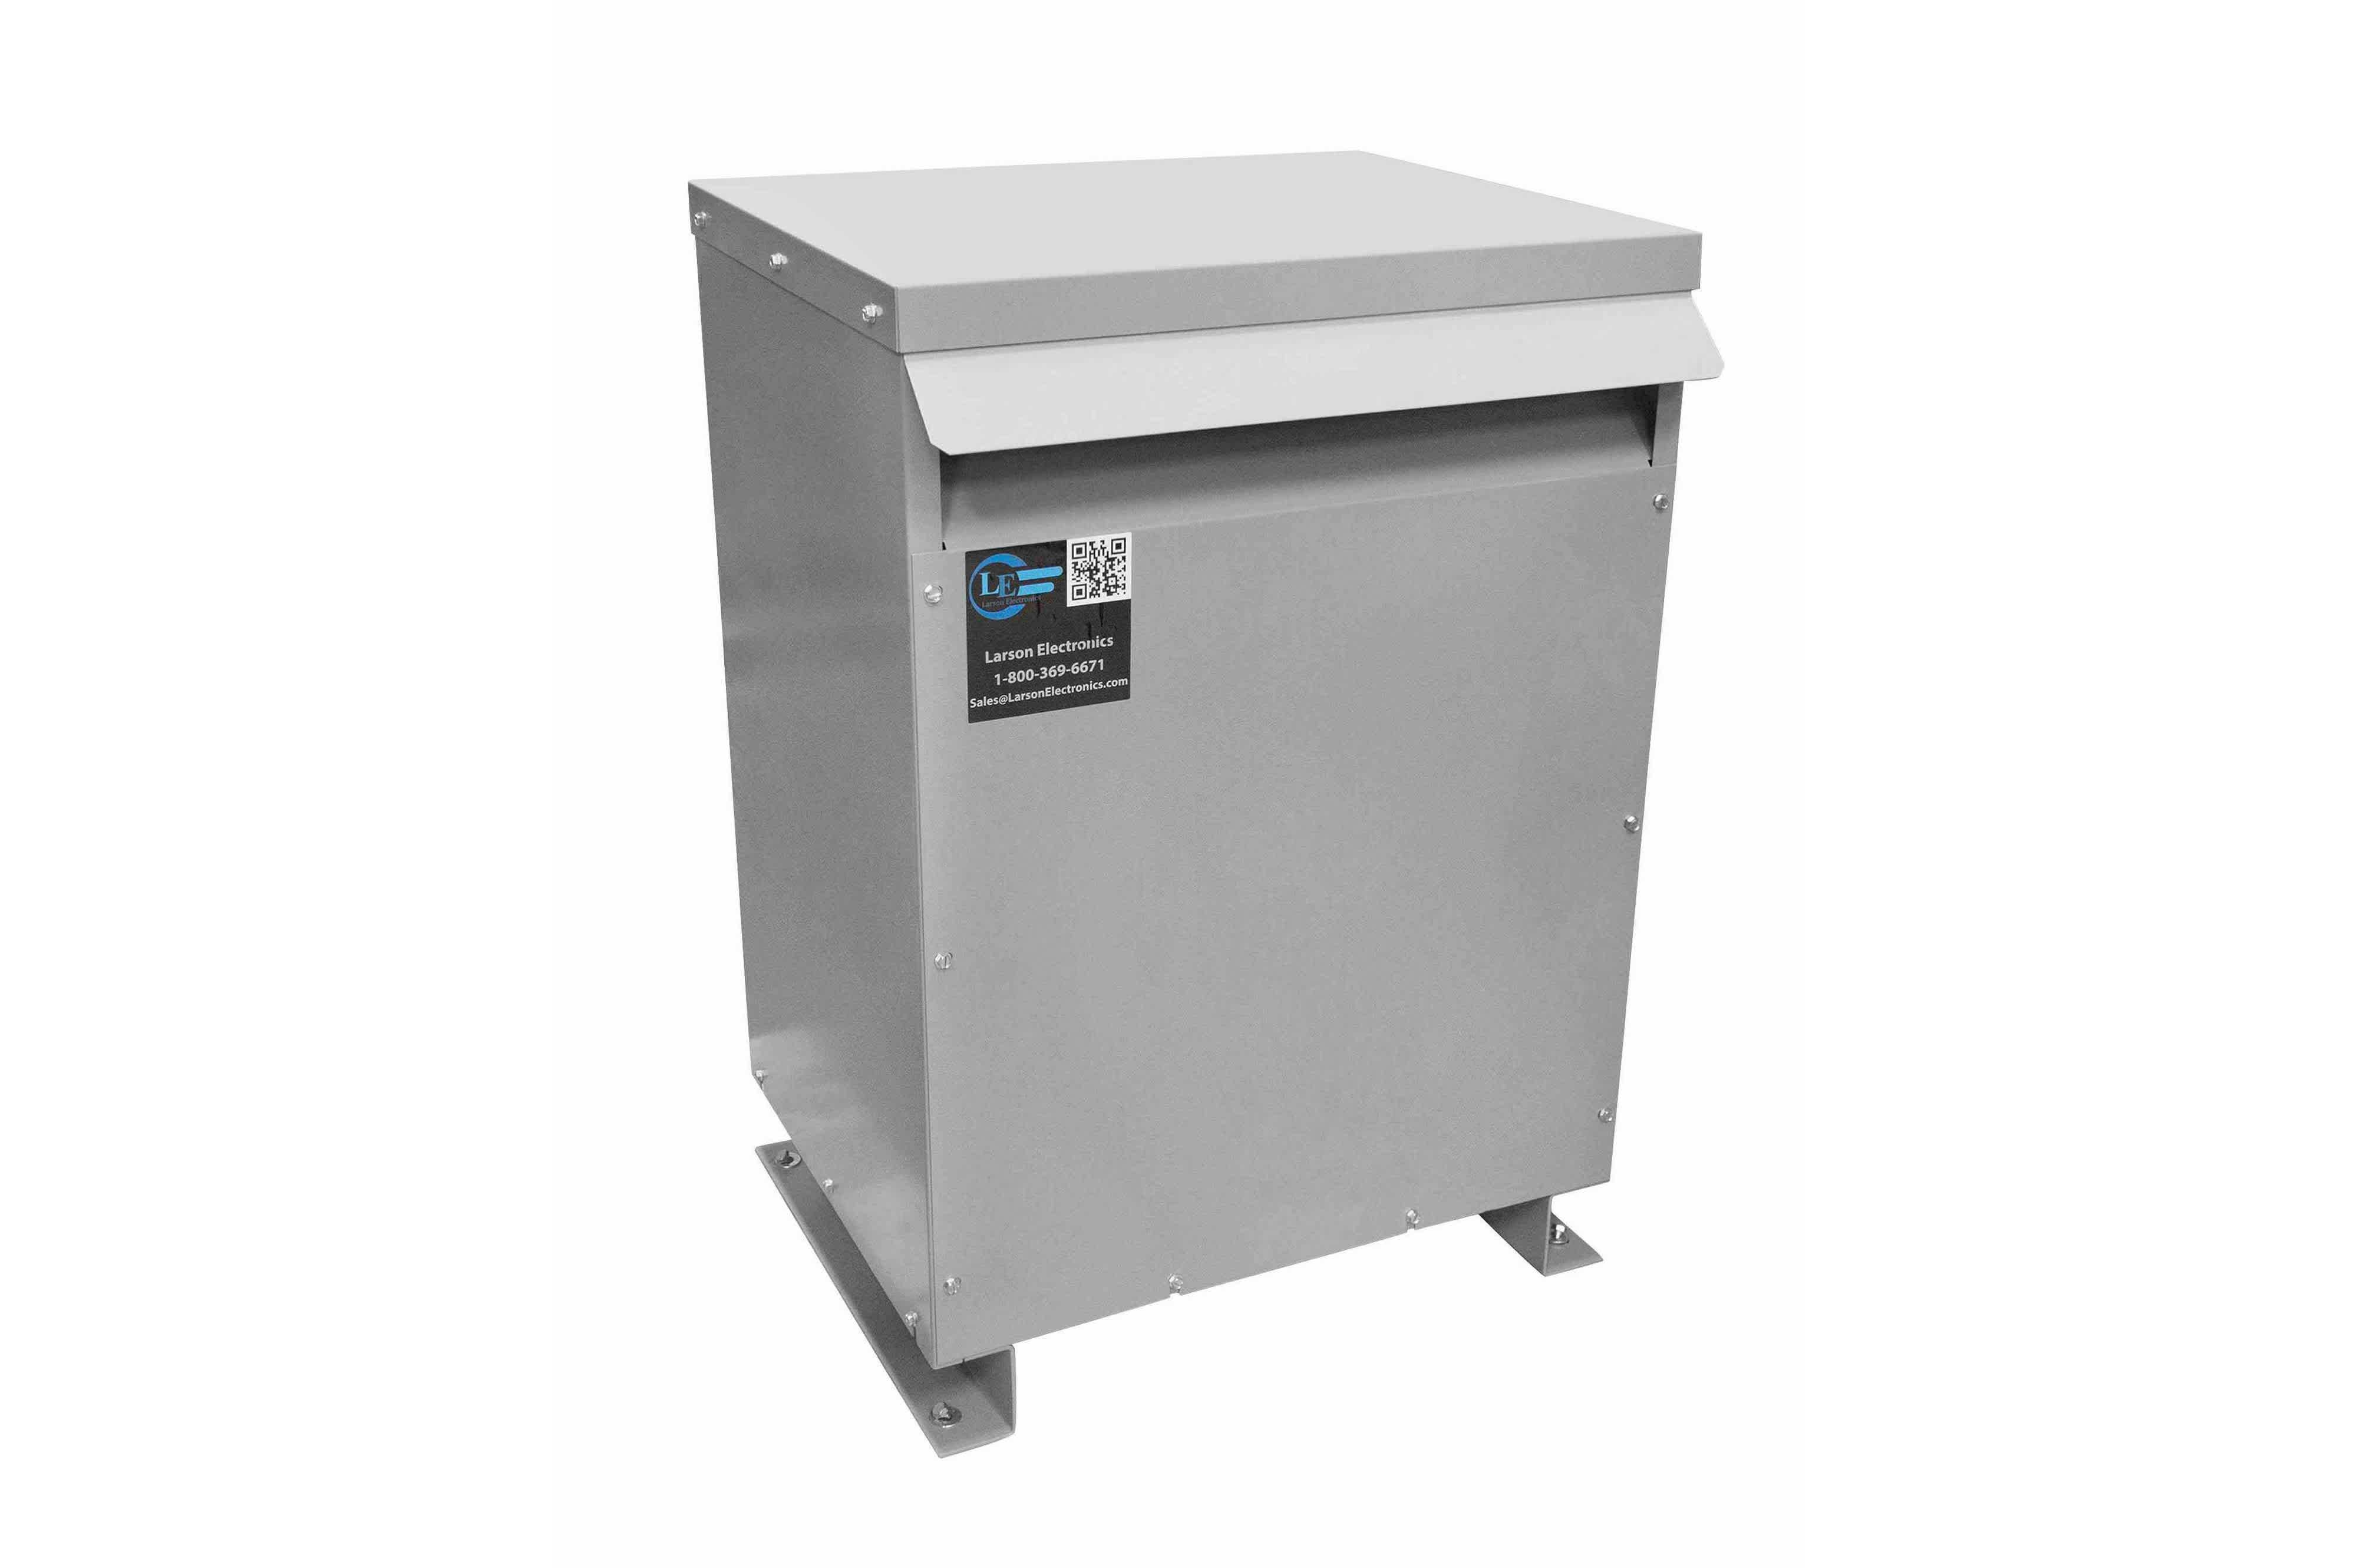 200 kVA 3PH DOE Transformer, 480V Delta Primary, 208Y/120 Wye-N Secondary, N3R, Ventilated, 60 Hz